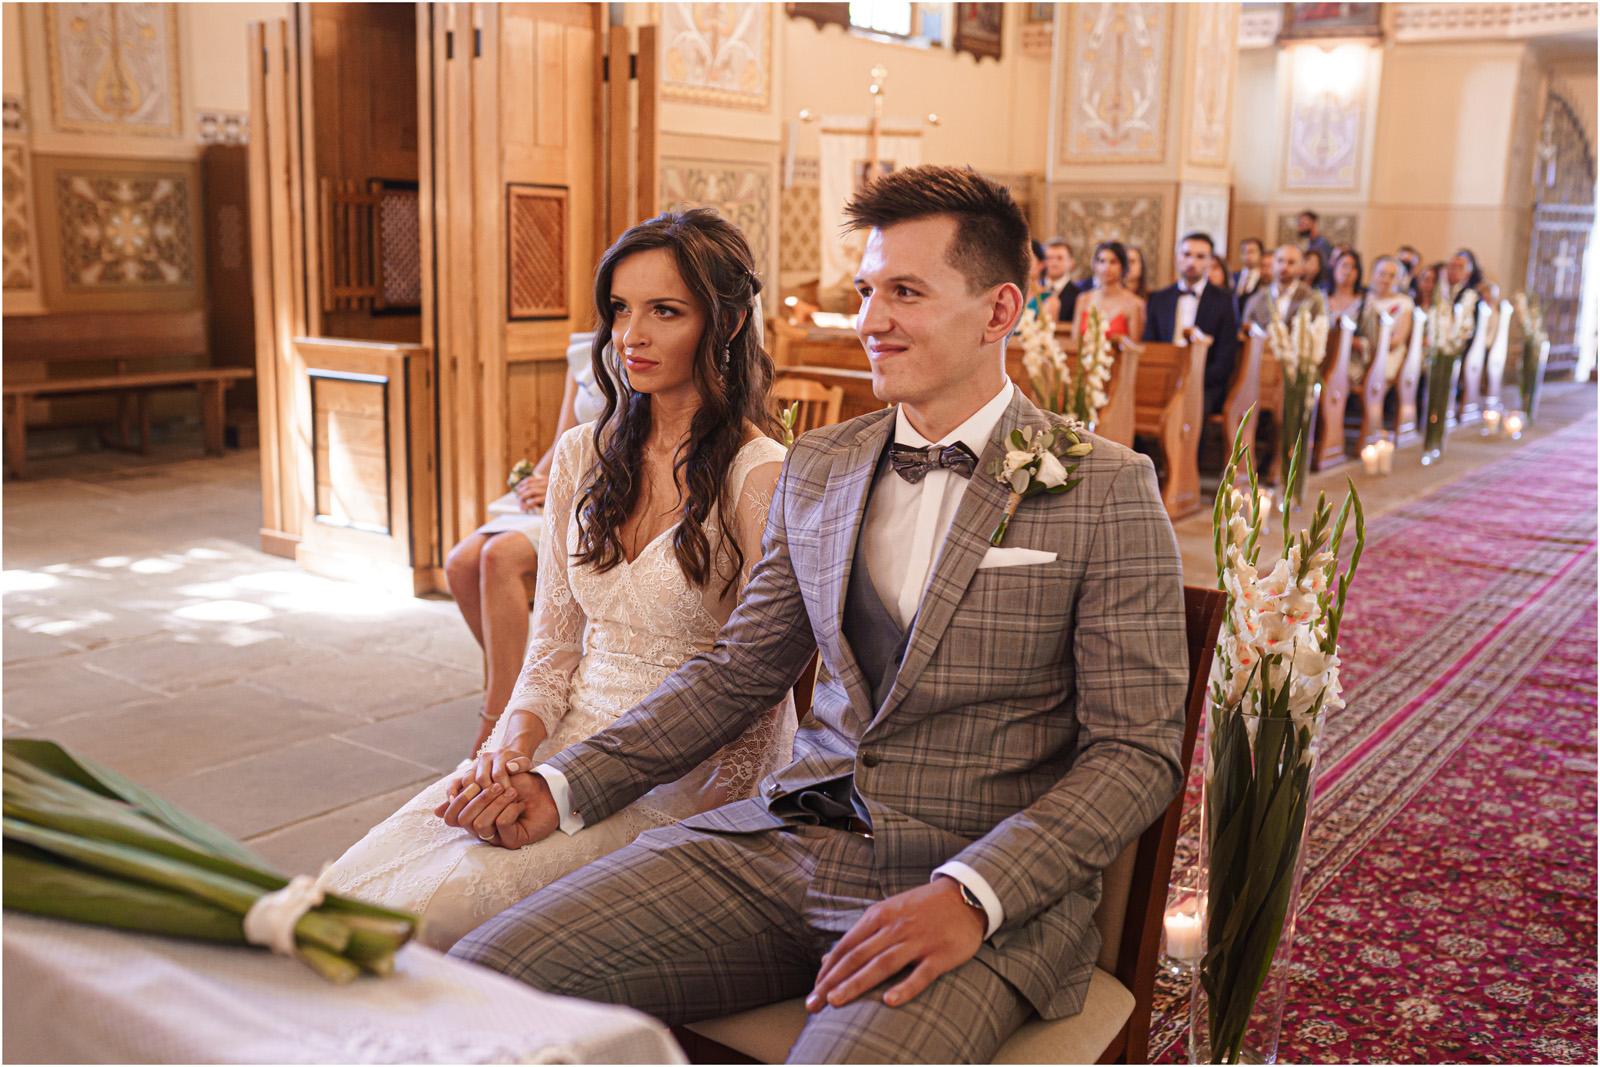 Ania & Mateusz | boho wesele w Stodole pod Kasztanami 43